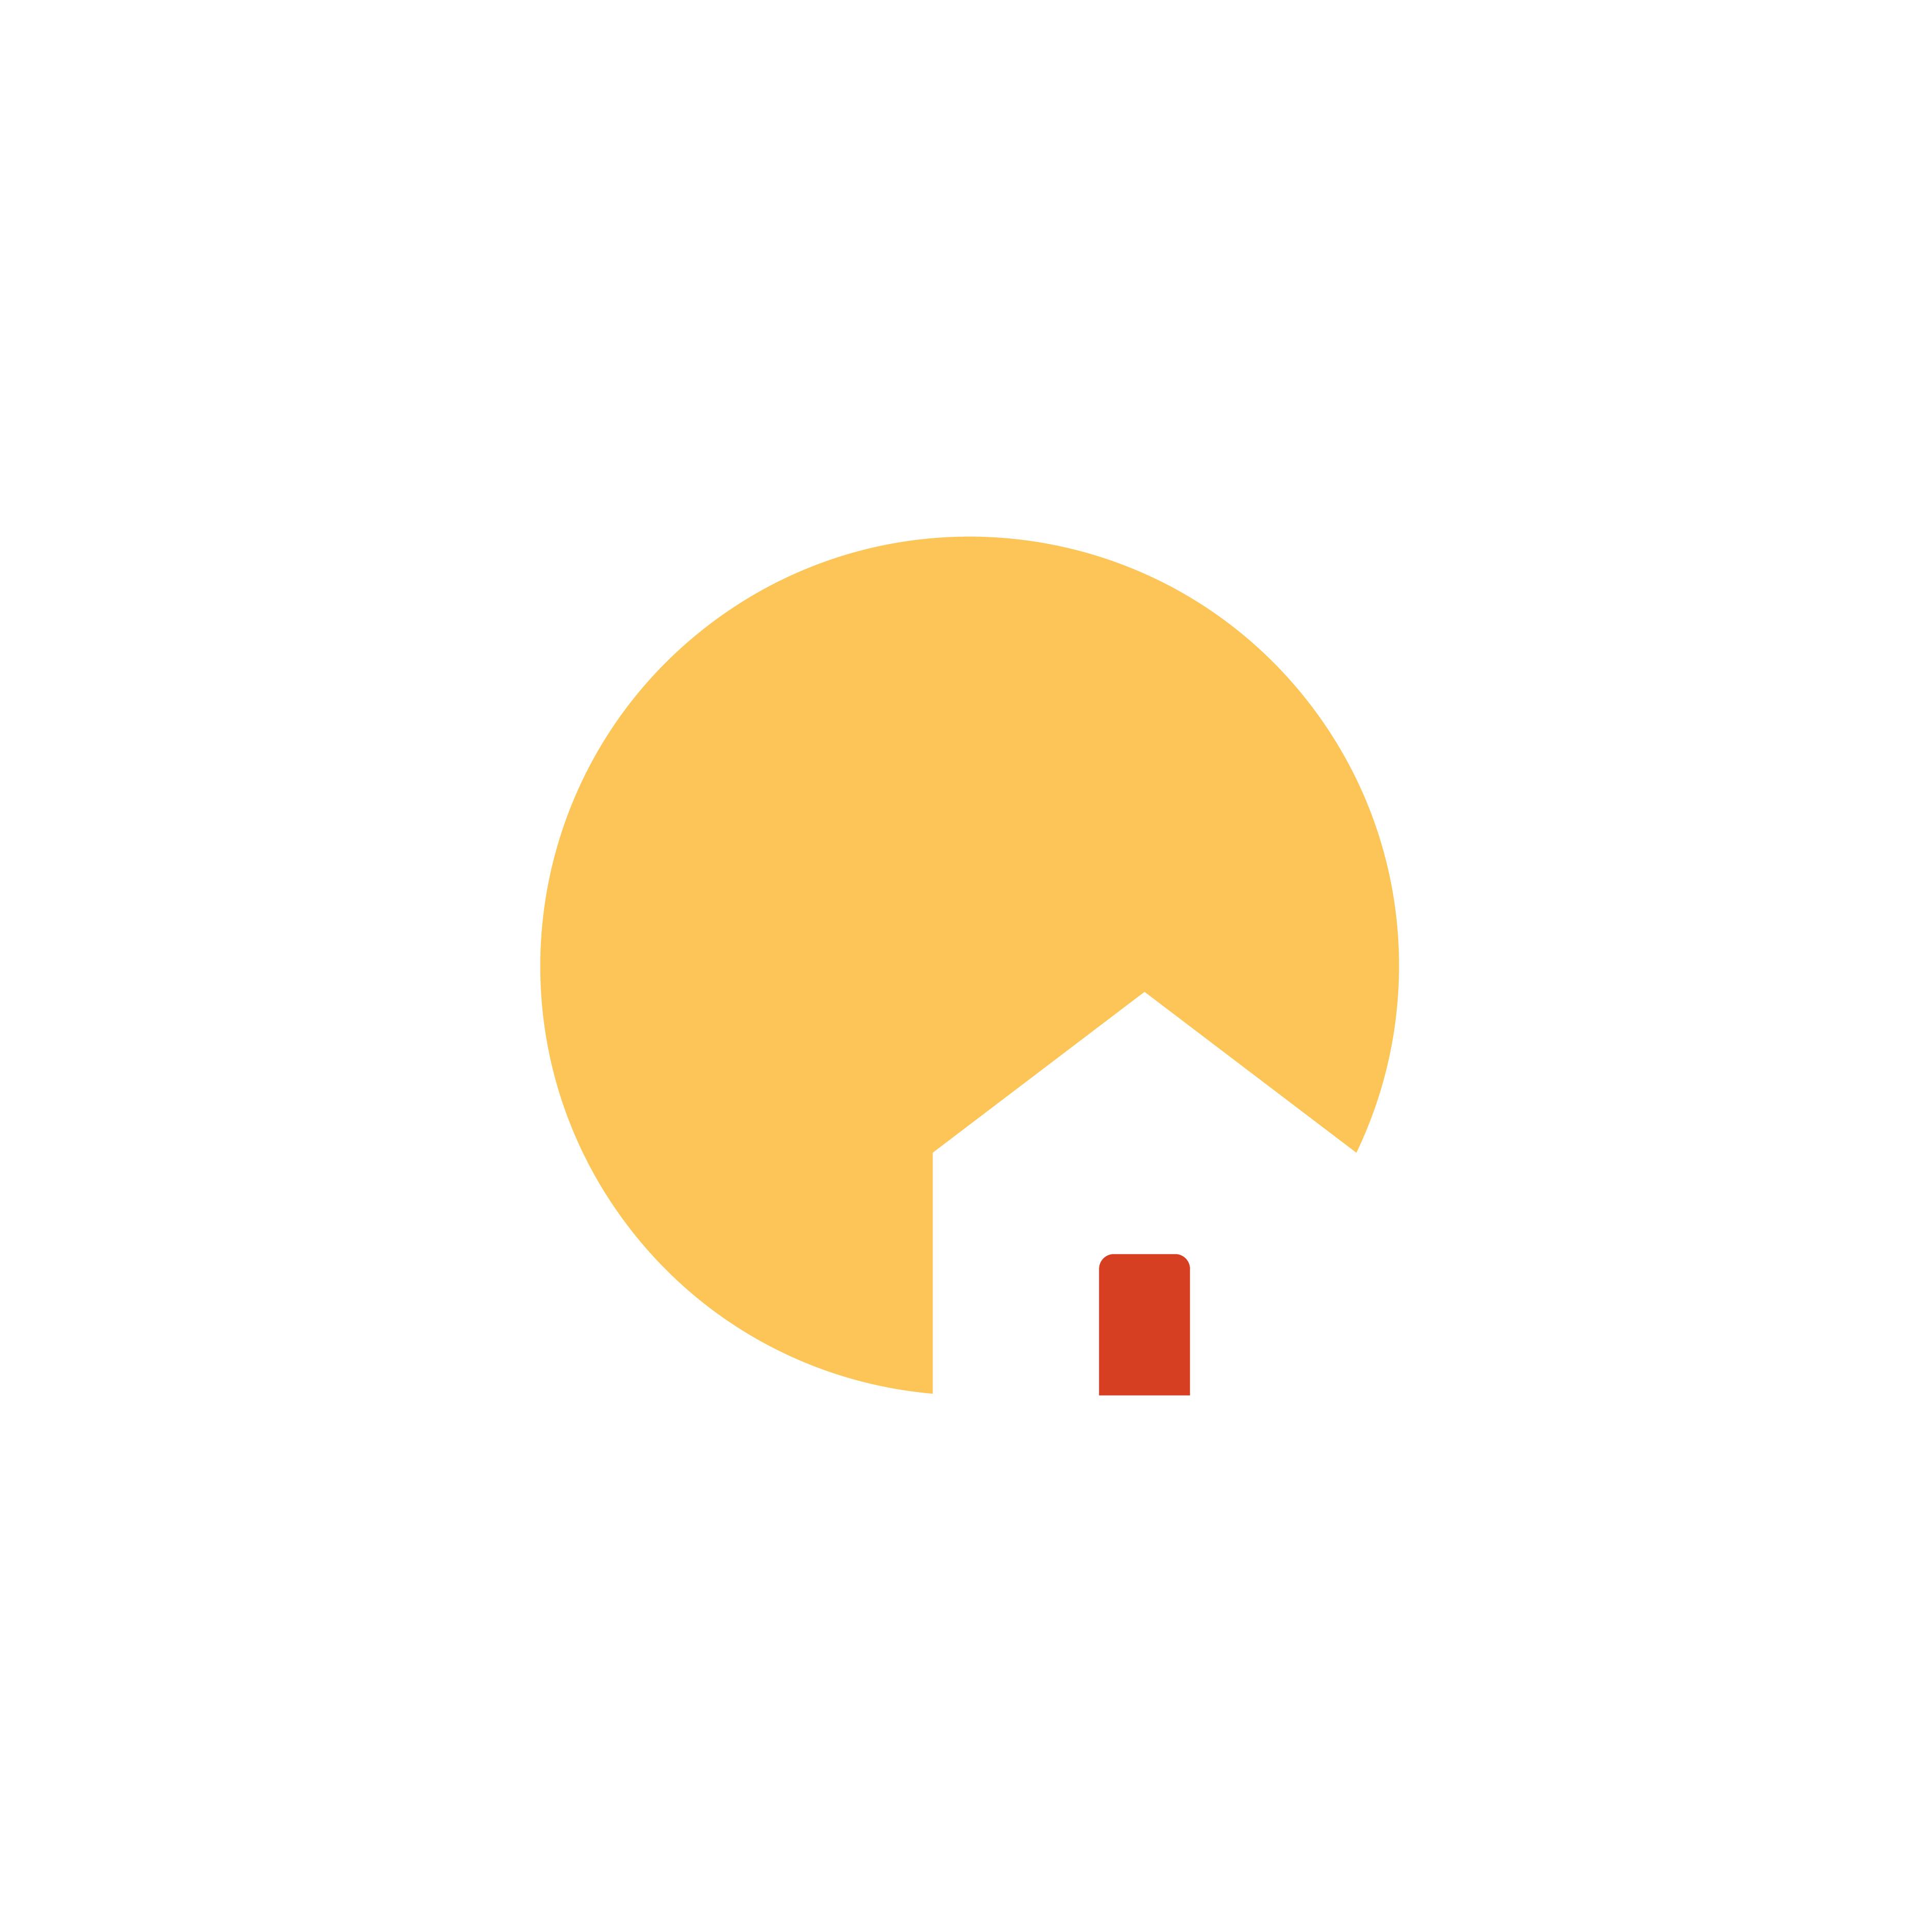 Solarize My Bill logo design by logo designer brandclay